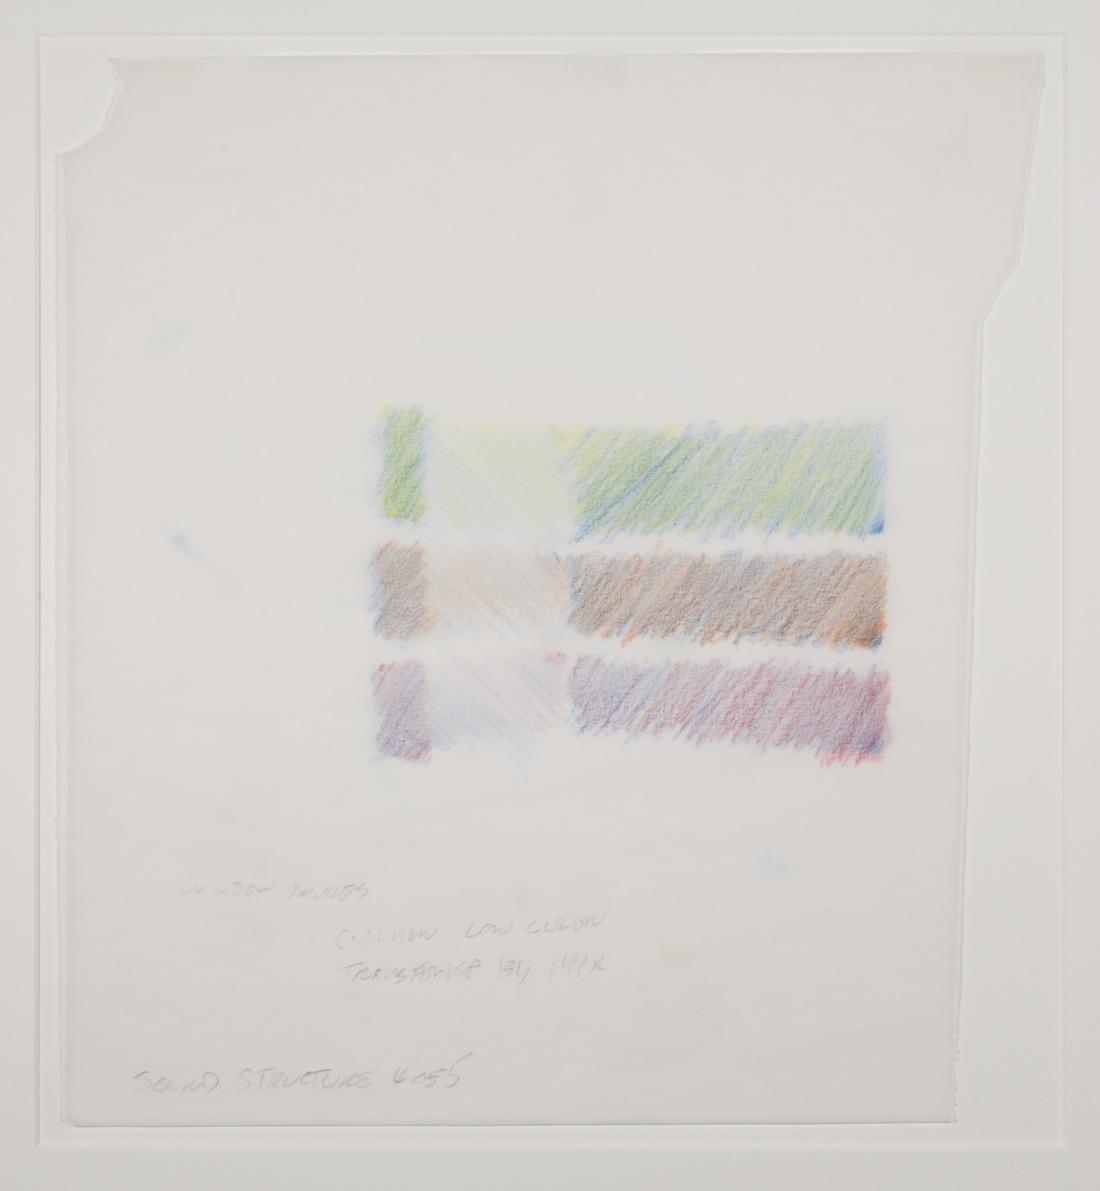 Max Neuhaus, Sound Structure, Three to One, 1991